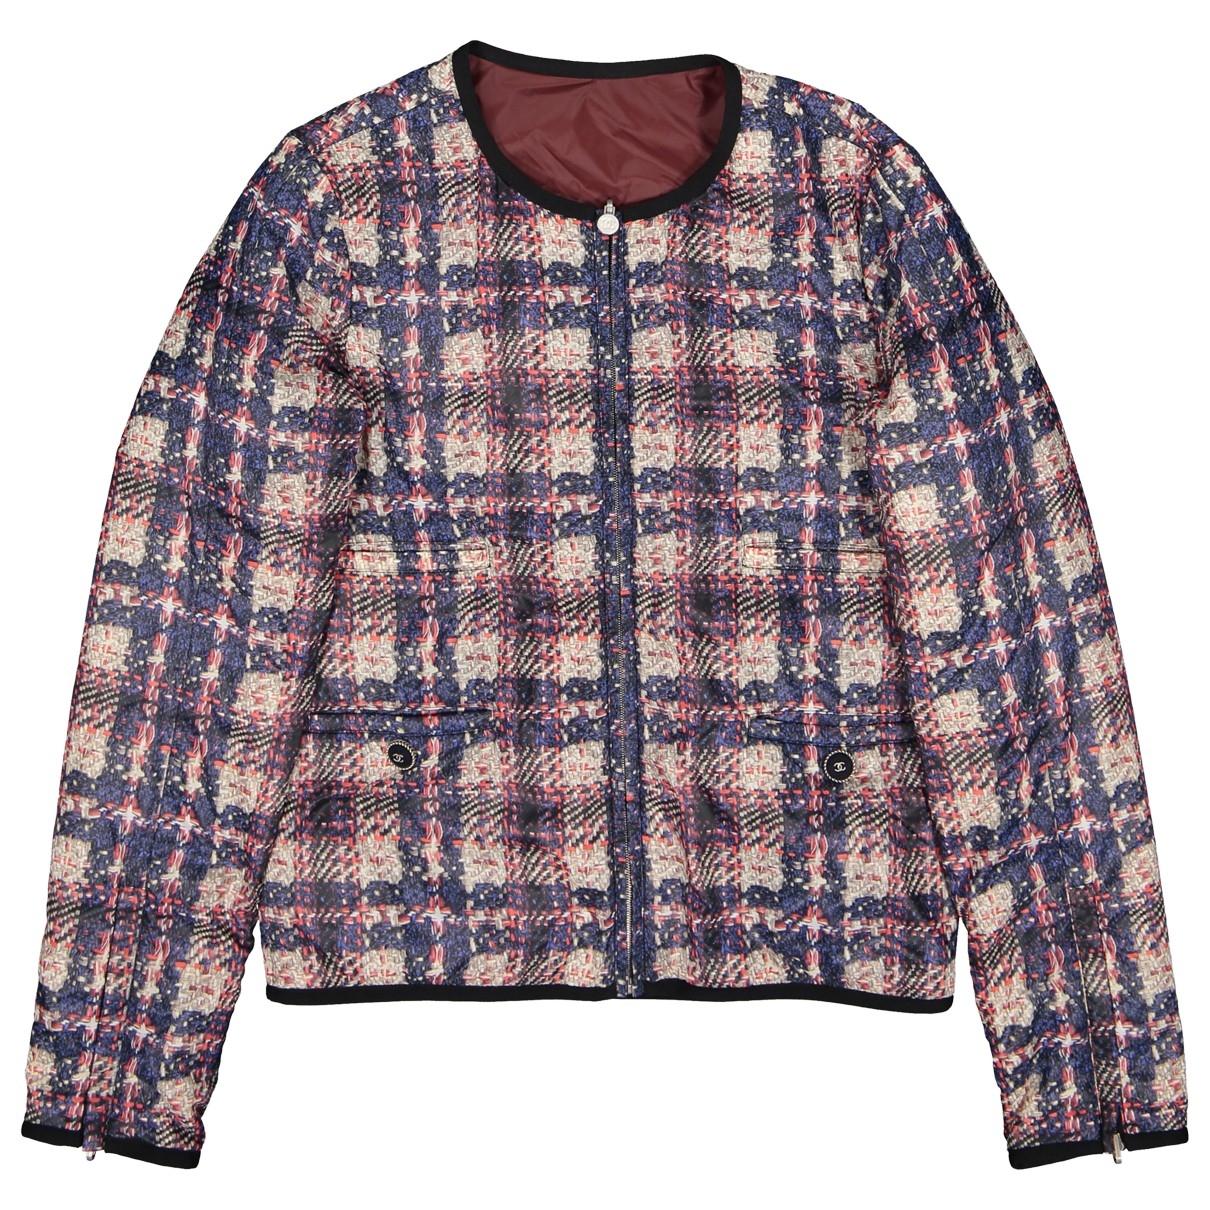 Chanel \N Burgundy jacket for Women 36 FR